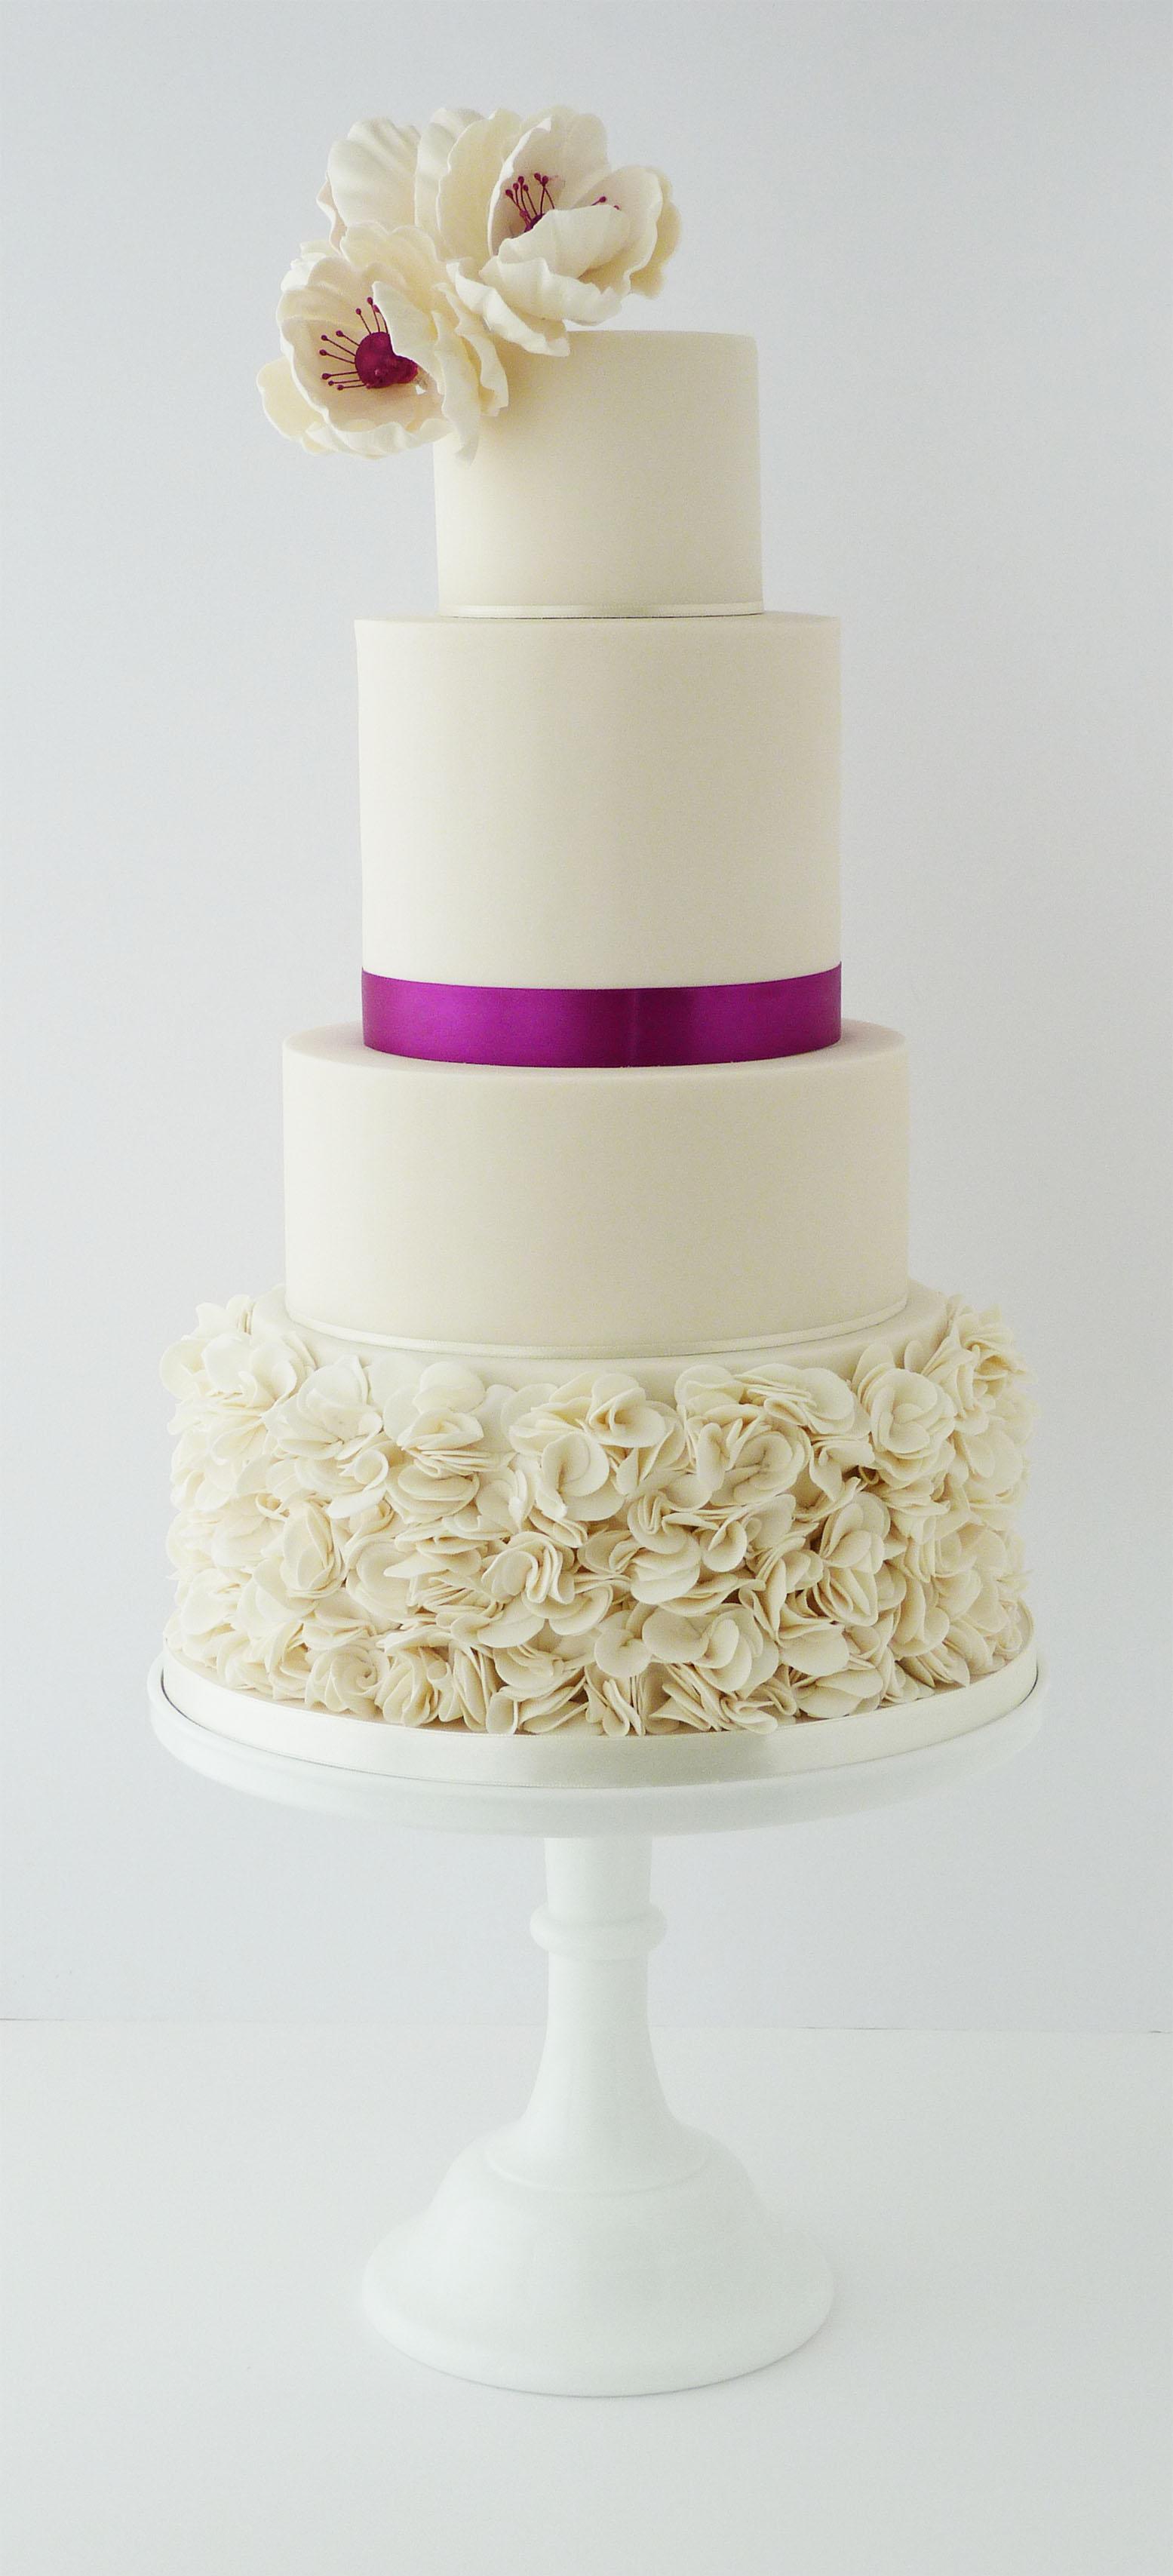 Stephanie and Mark ruffle wedding cake.jpg